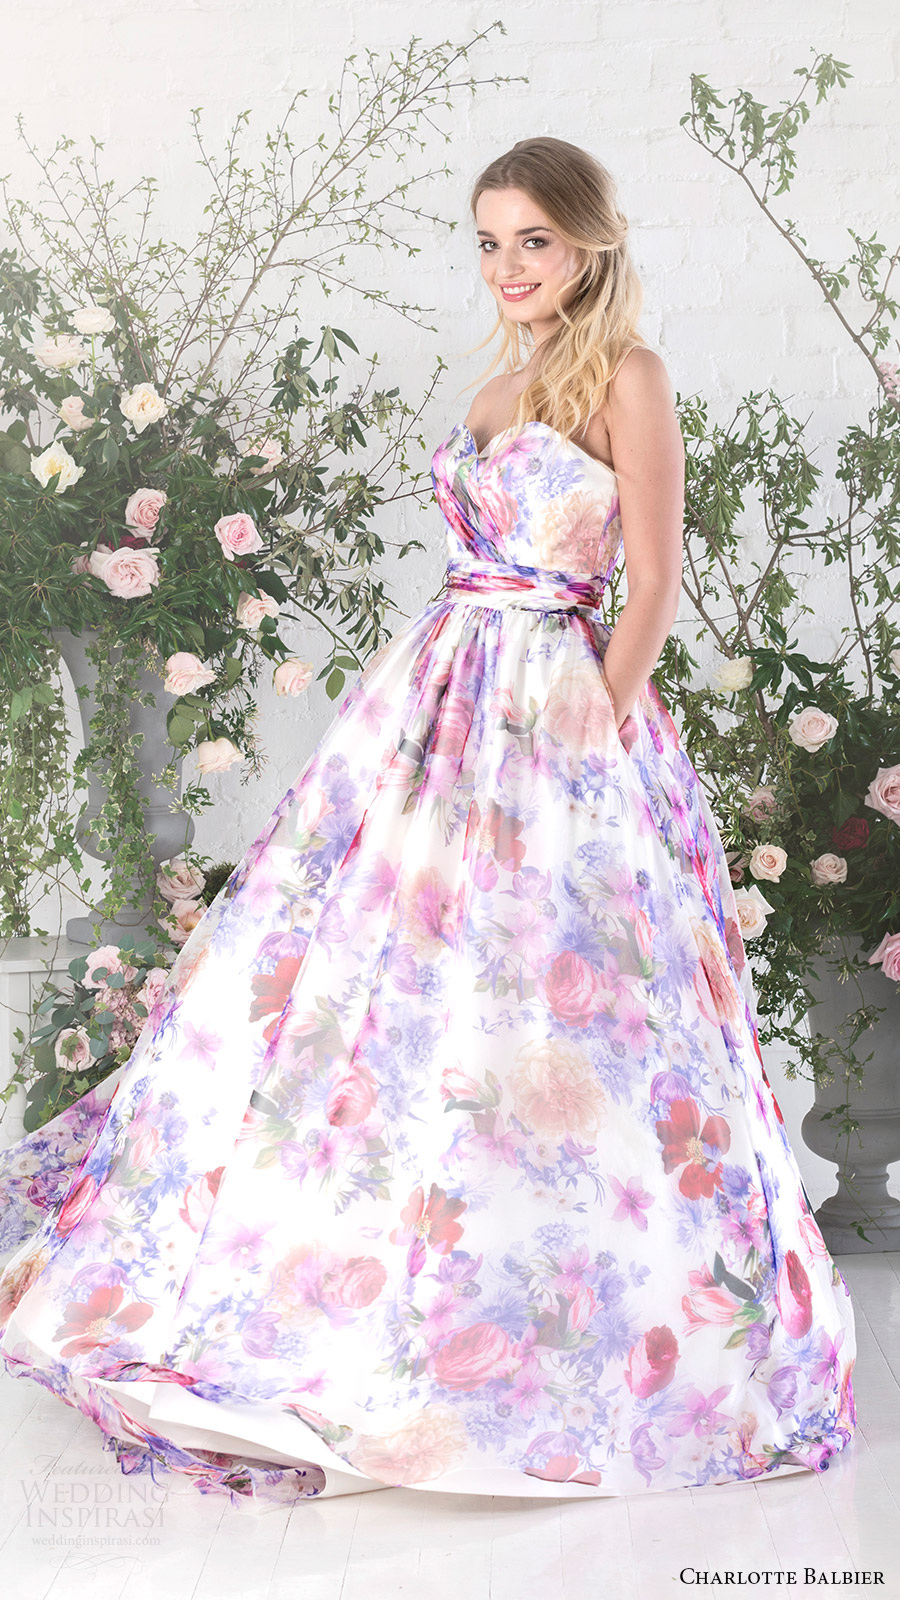 Floral Print Wedding Dresses 7 Fabulous charlotte balbier bridal strapless